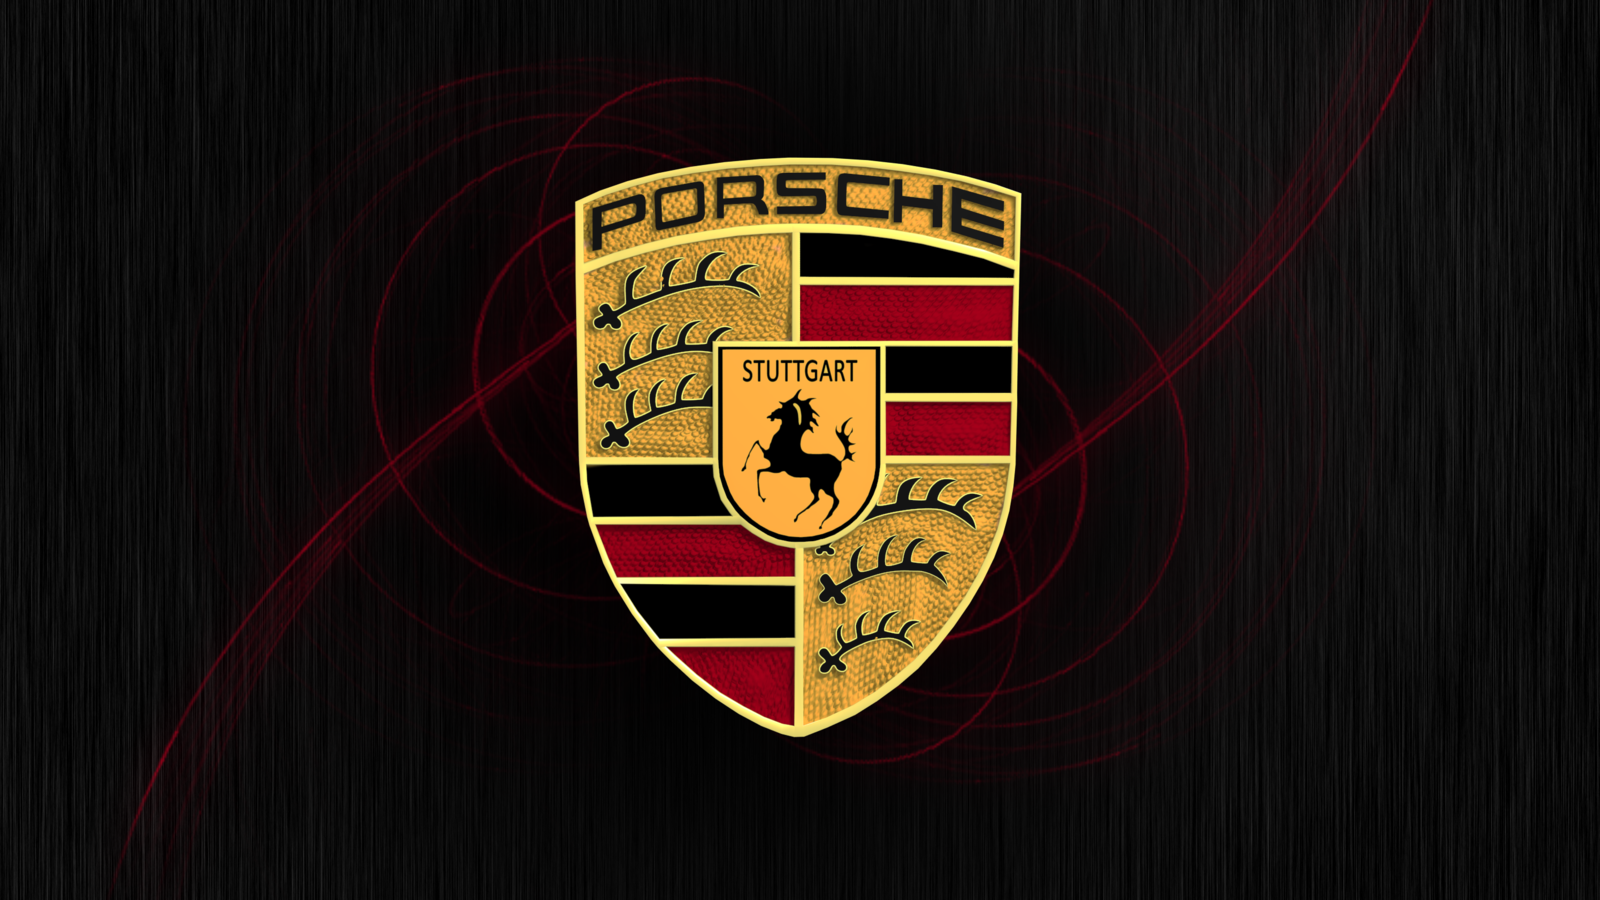 photo searches porsche emblem wallpaper